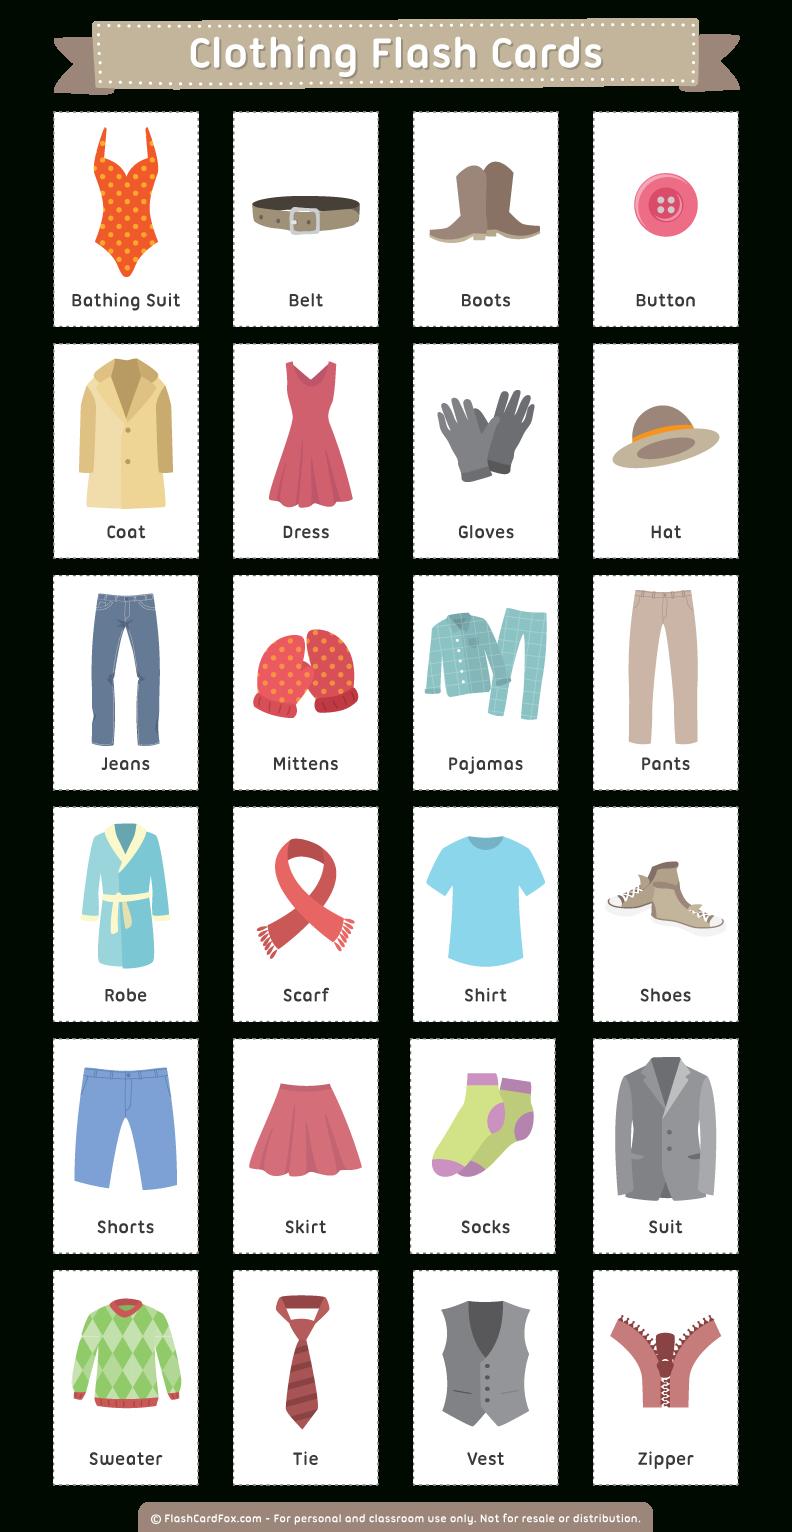 Printable Clothing Flash Cards - Free Printable Clothing Flashcards